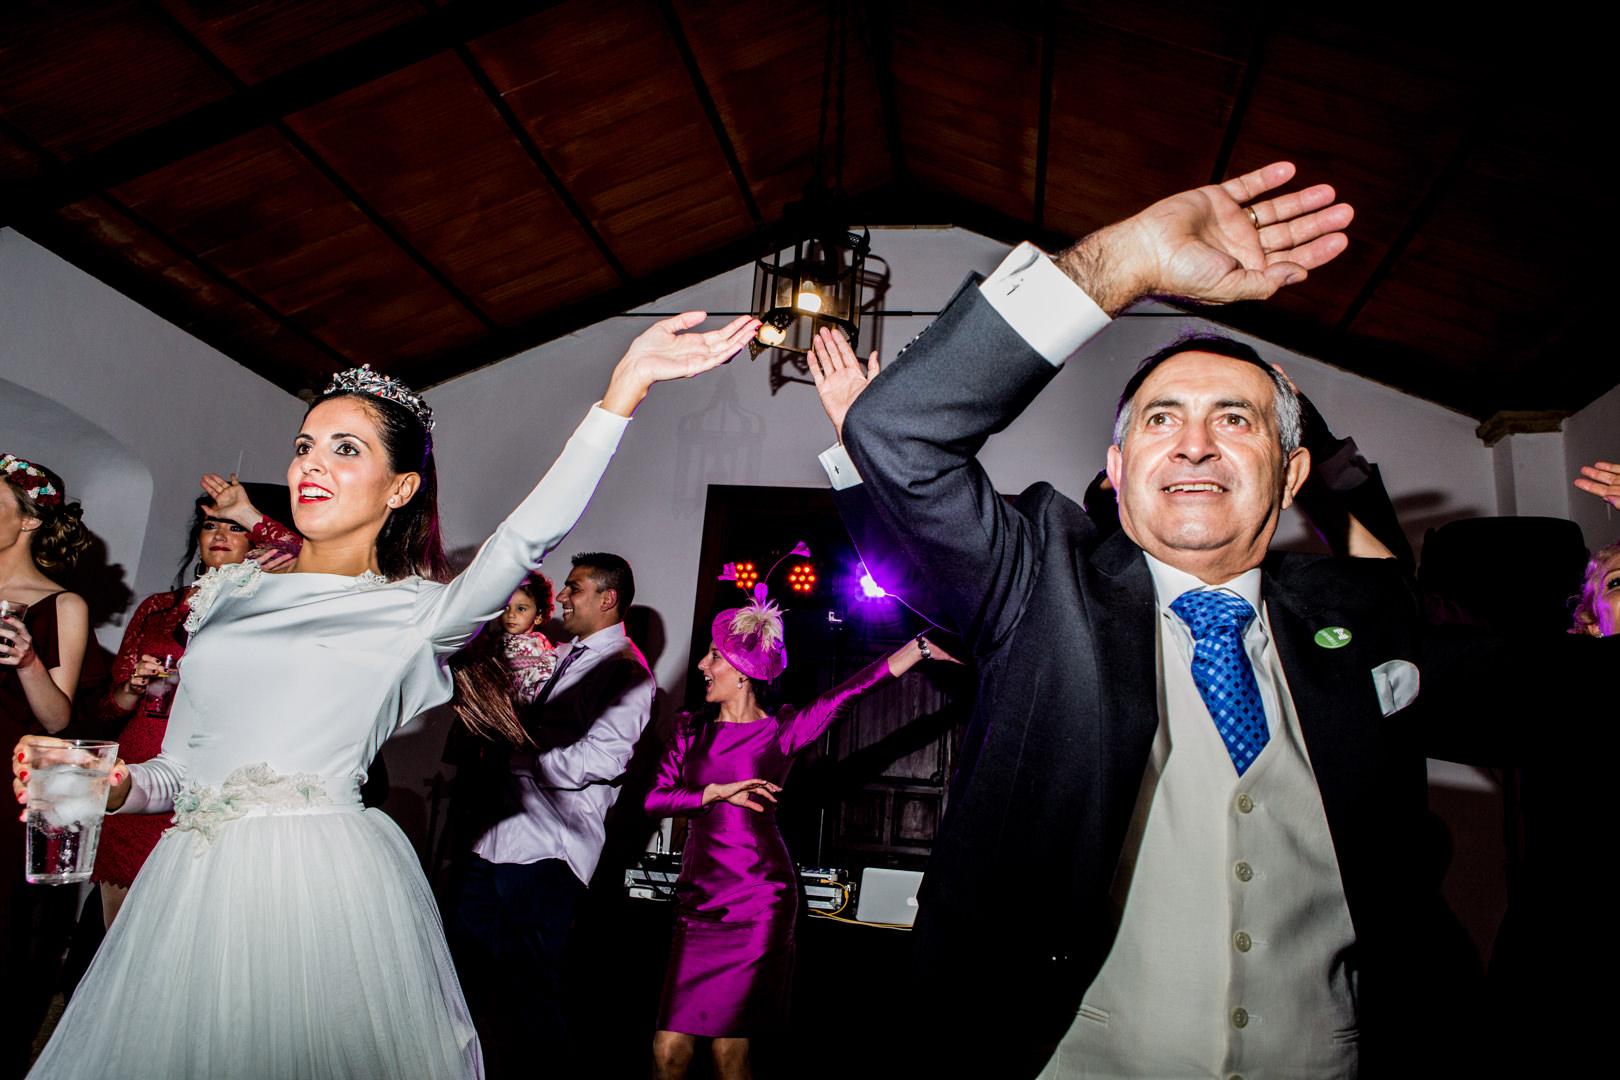 Boda-sevilla-Wedding-engagement-Rafael-Torres-fotografo-bodas-sevilla-madrid-barcelona-wedding-photographer--75.jpg